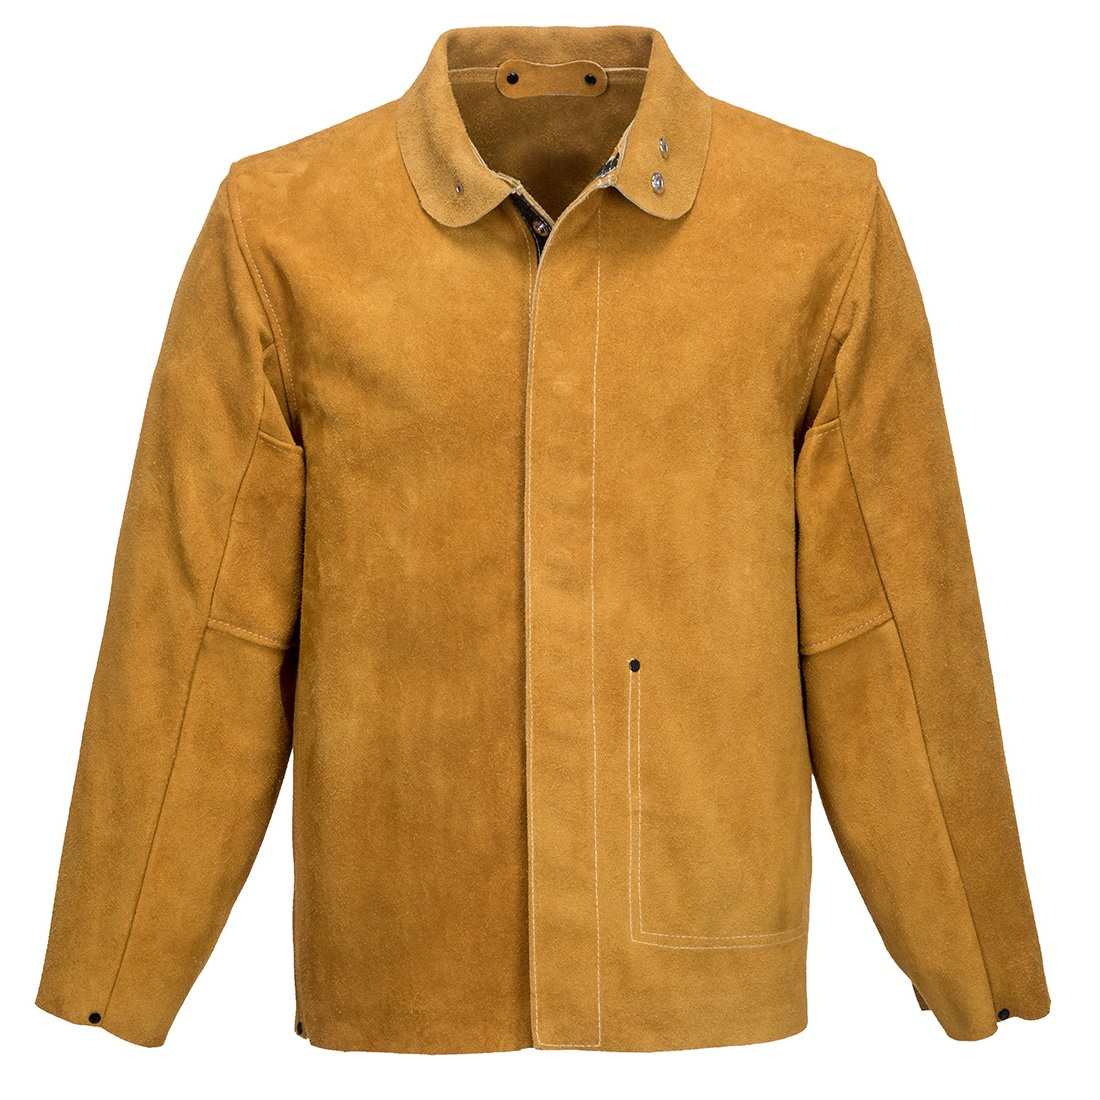 Portwest Leather Welding Jacket